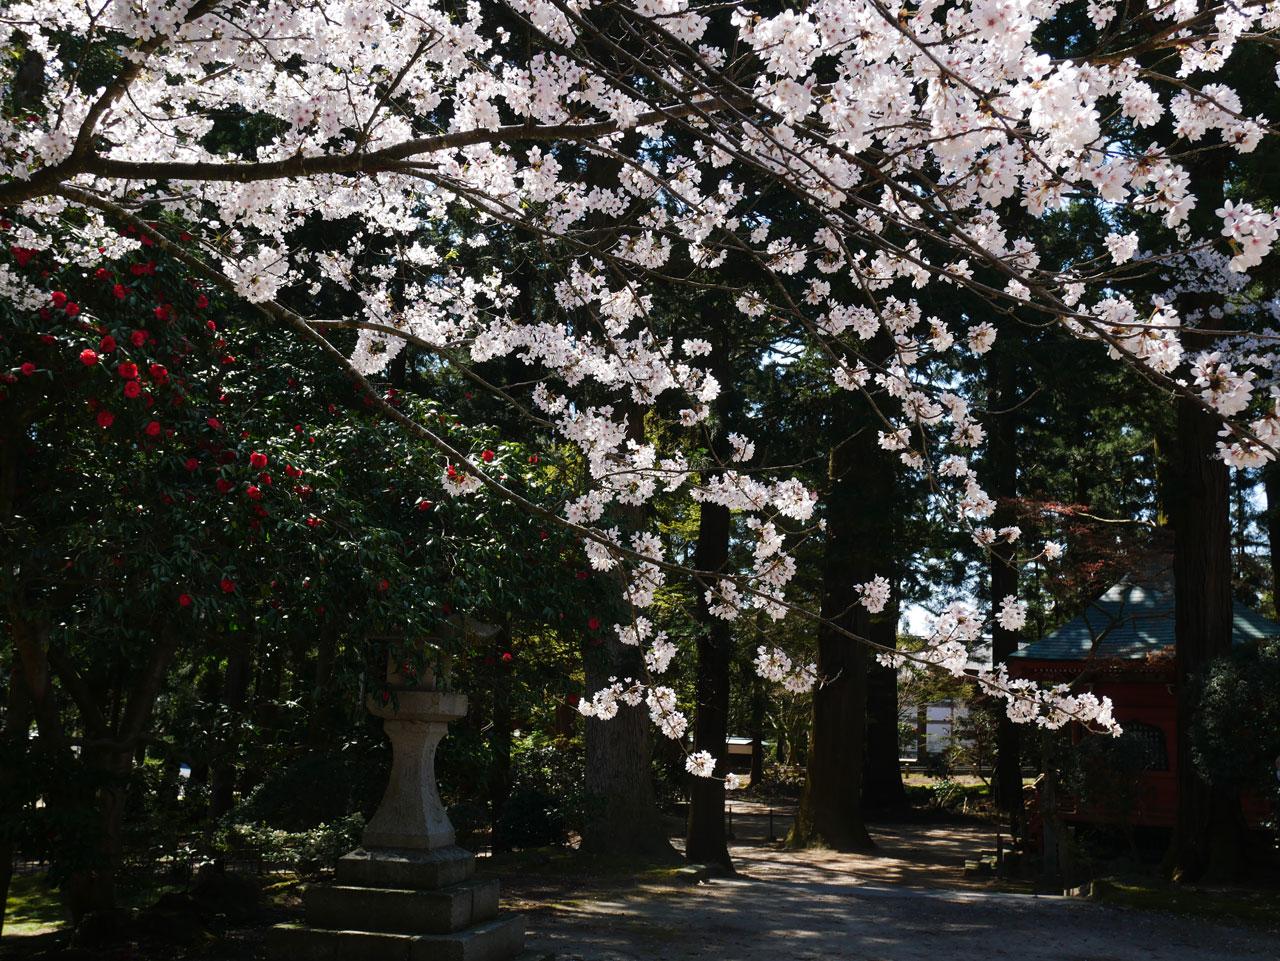 乙宝寺の桜2:LUMIX DMC-GX7MK2+LUMIX G VARIO 12-32mm/F3.5-5.6